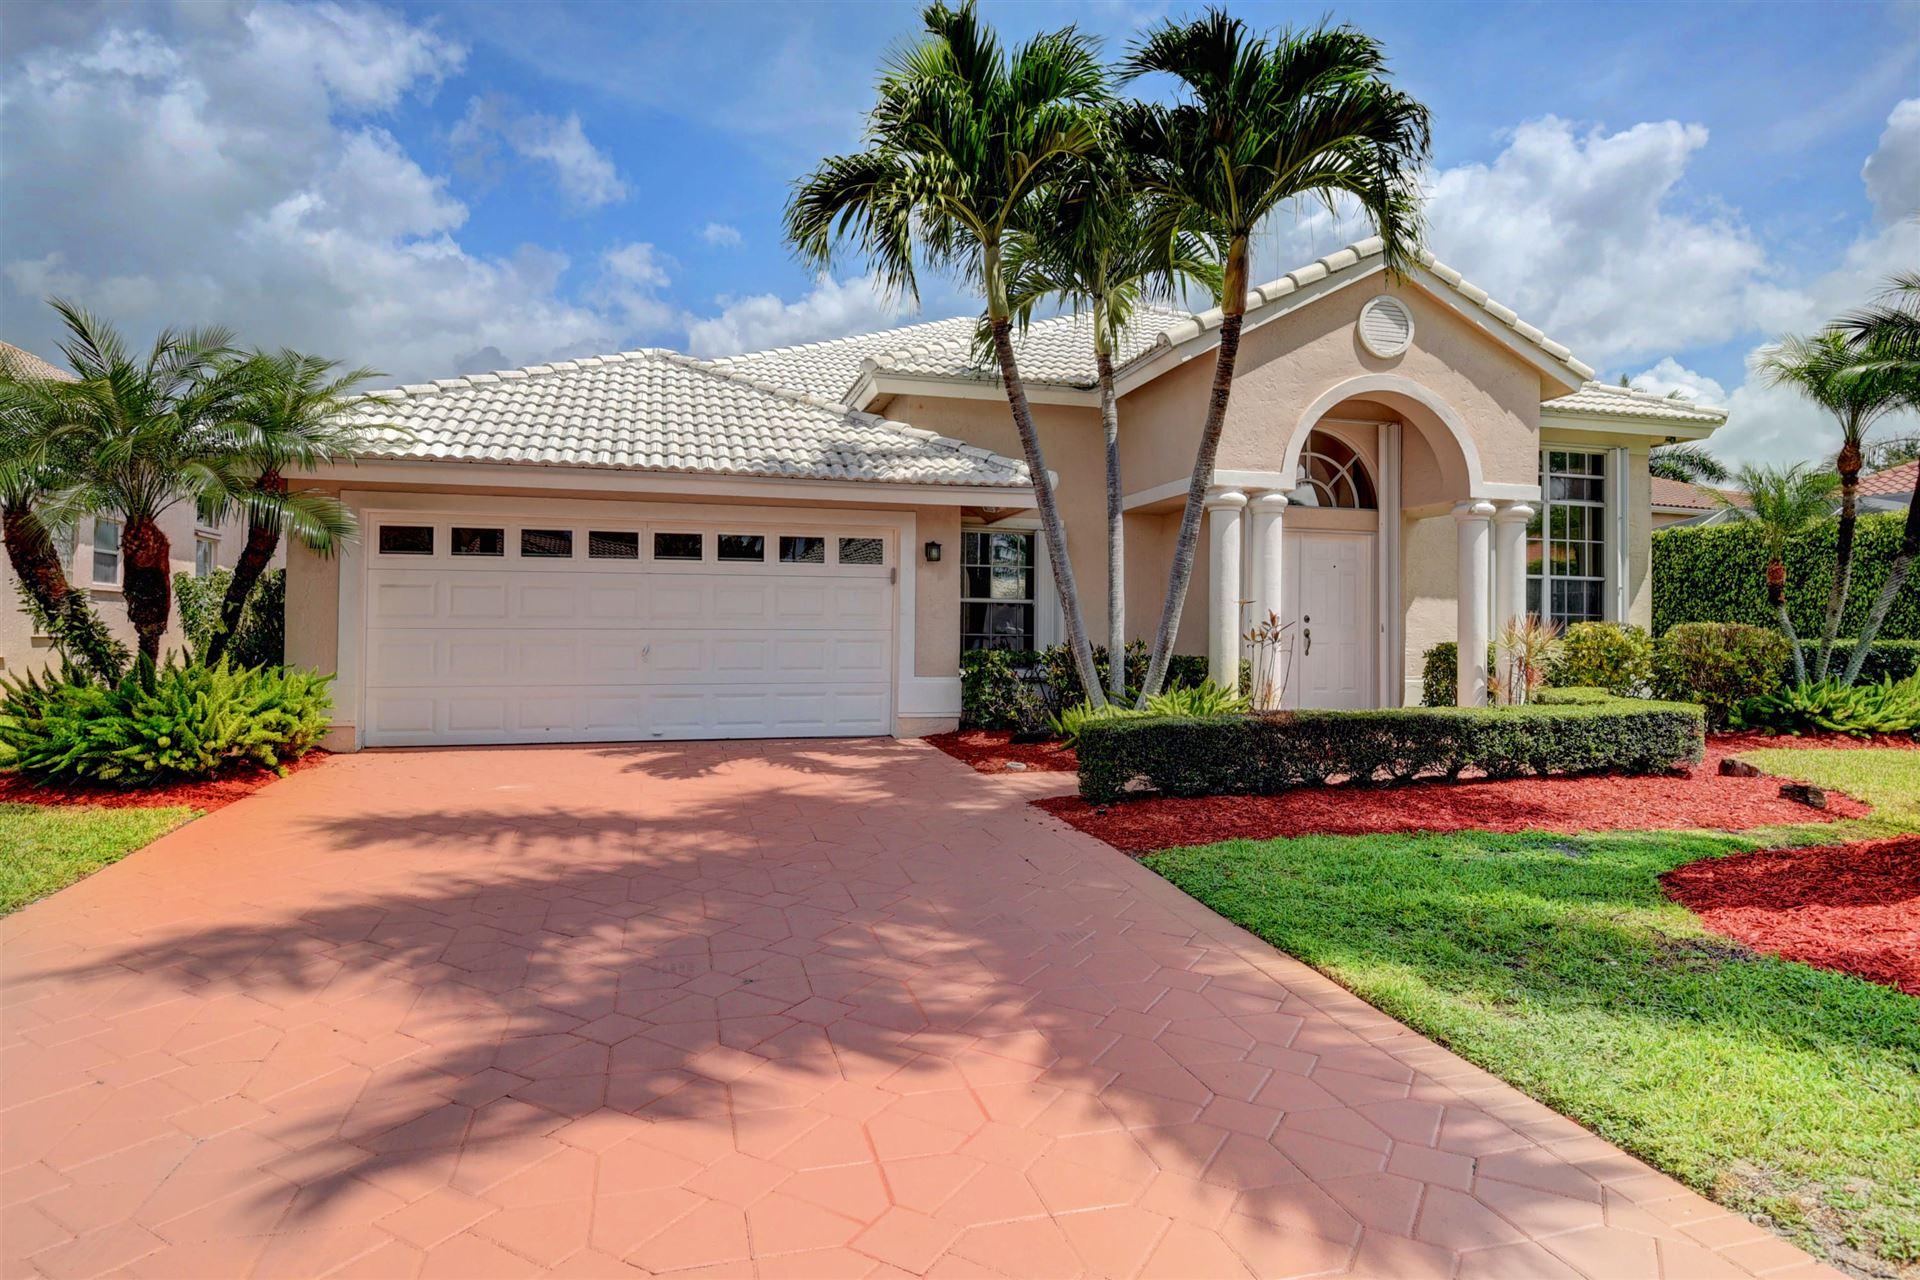 19401 Preserve Drive, Boca Raton, FL 33498 - #: RX-10637386